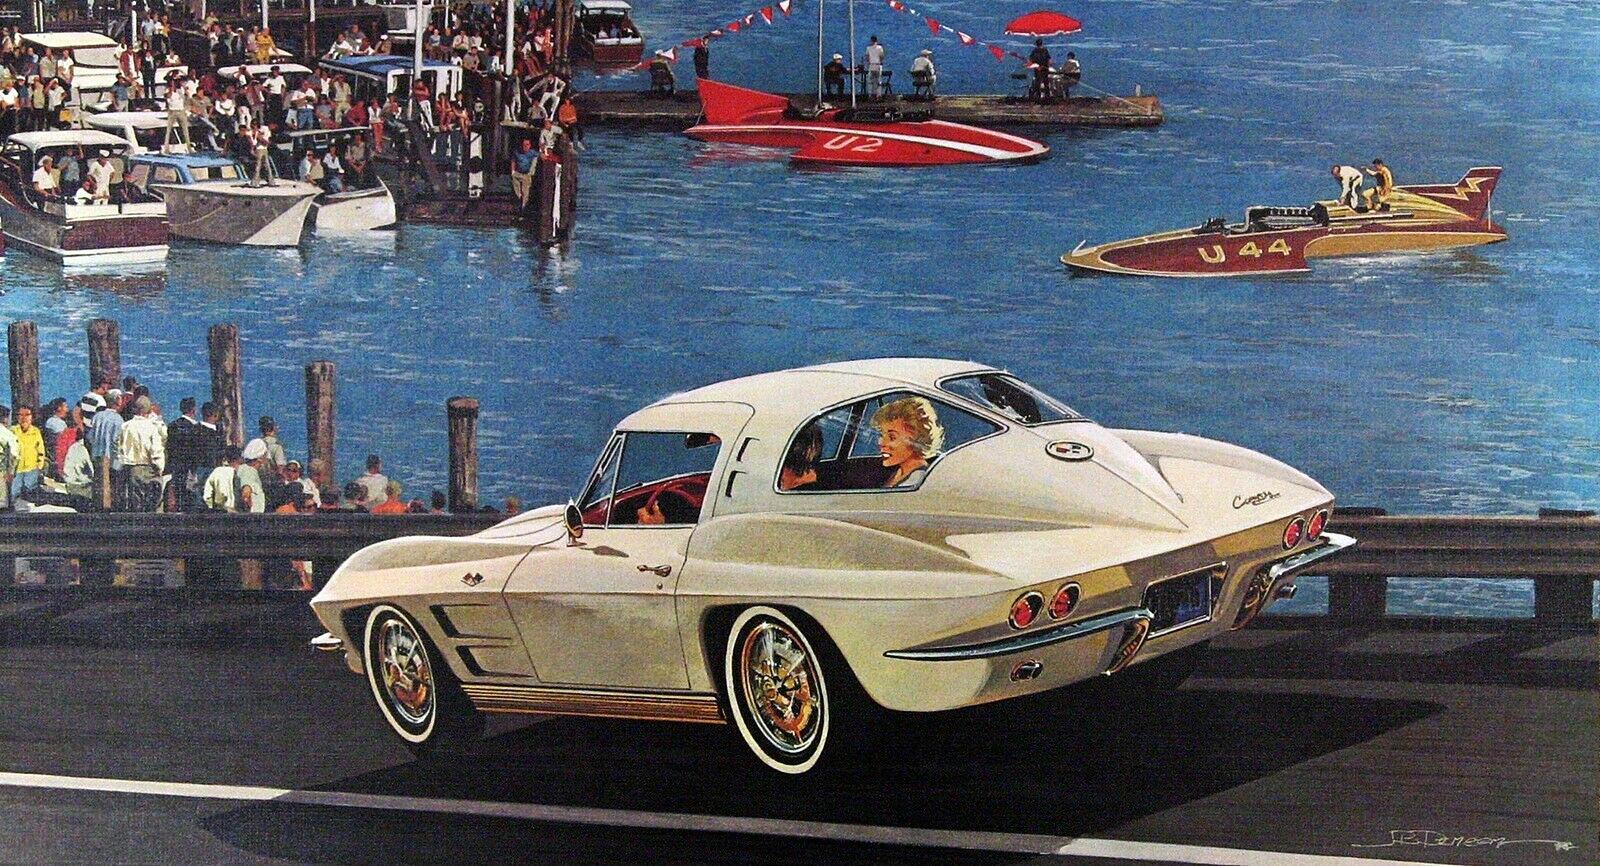 1963. Corvette Sting Ray. Illustrated by James B. Deneen